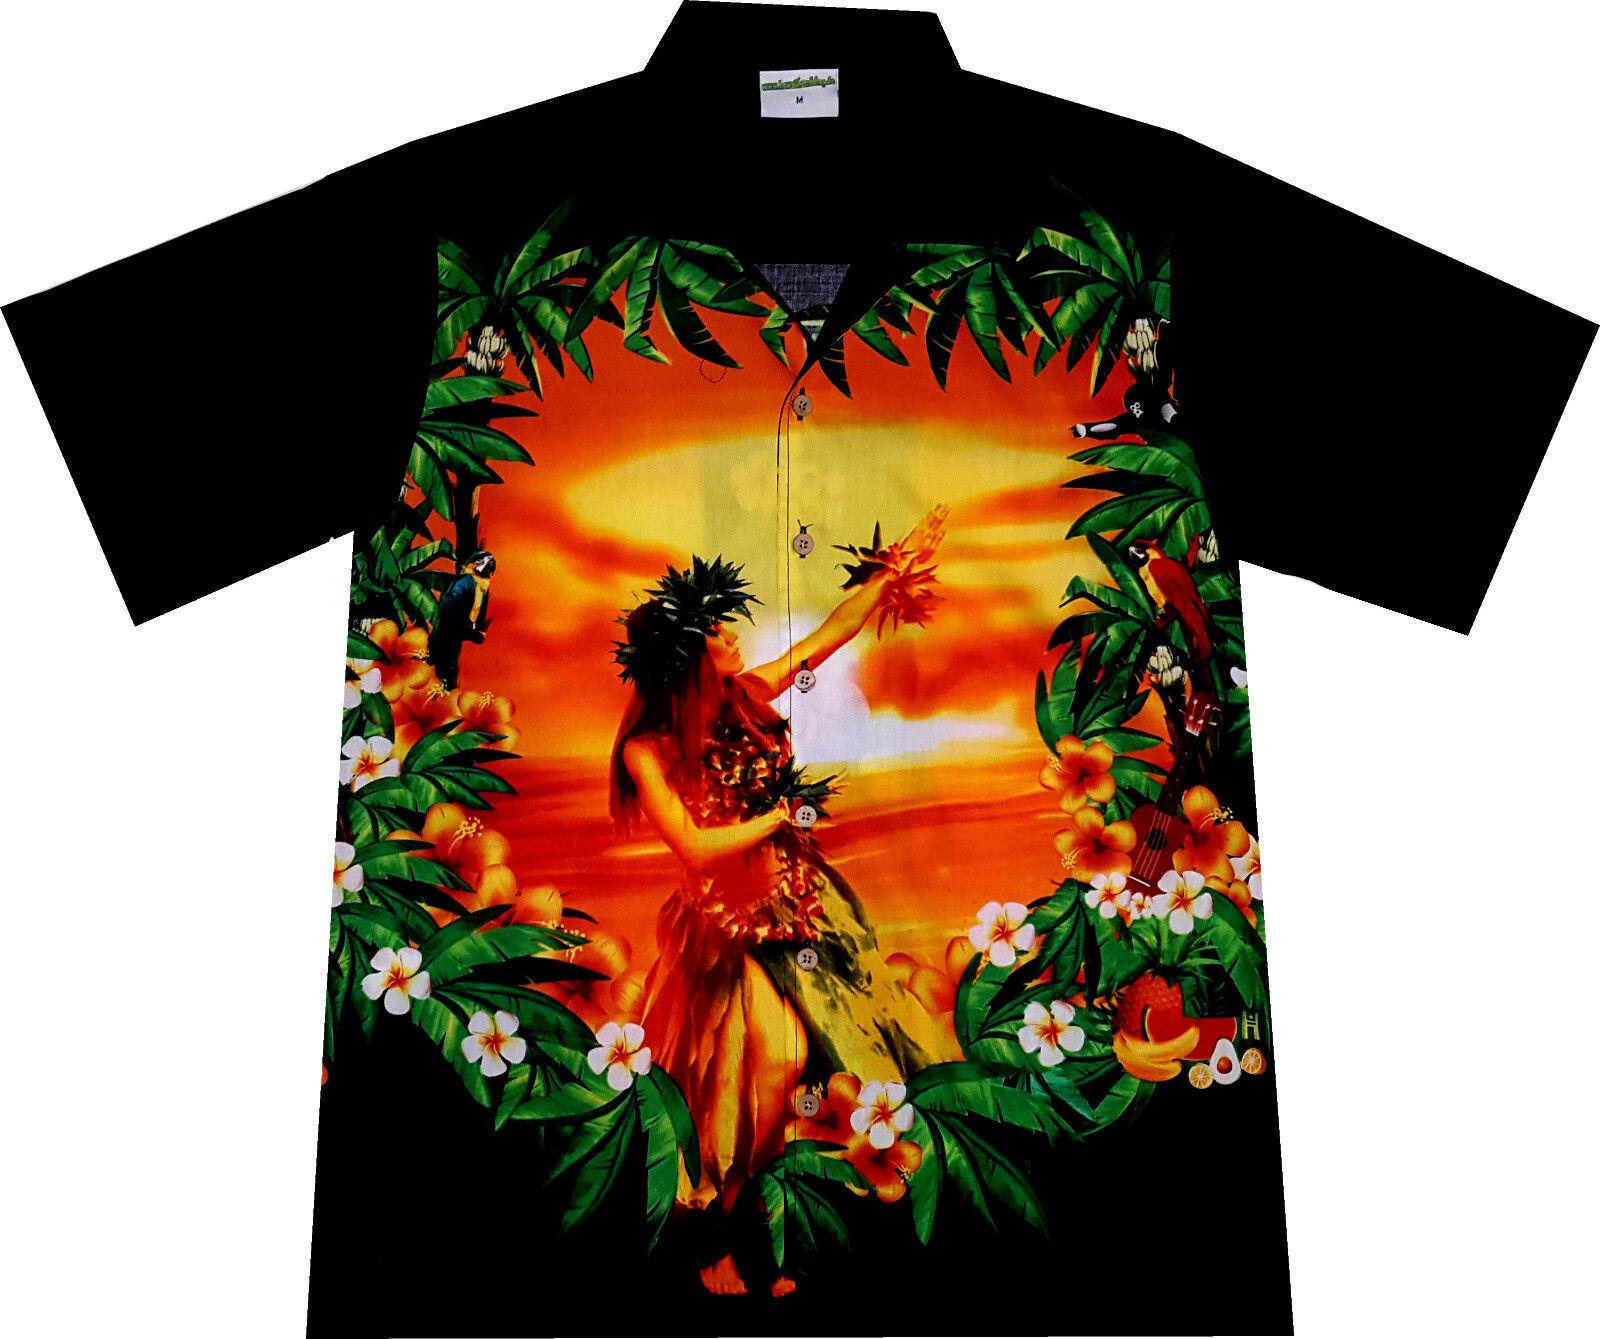 Hawaii Hemd S - 6XL 100% Baumwolle Hawaiihemd Hawaihemd Hawaihemd Hawaihemd Hawaiishirt Hawaiihemden | Deutschland Frankfurt  | Großer Verkauf  e2bd46